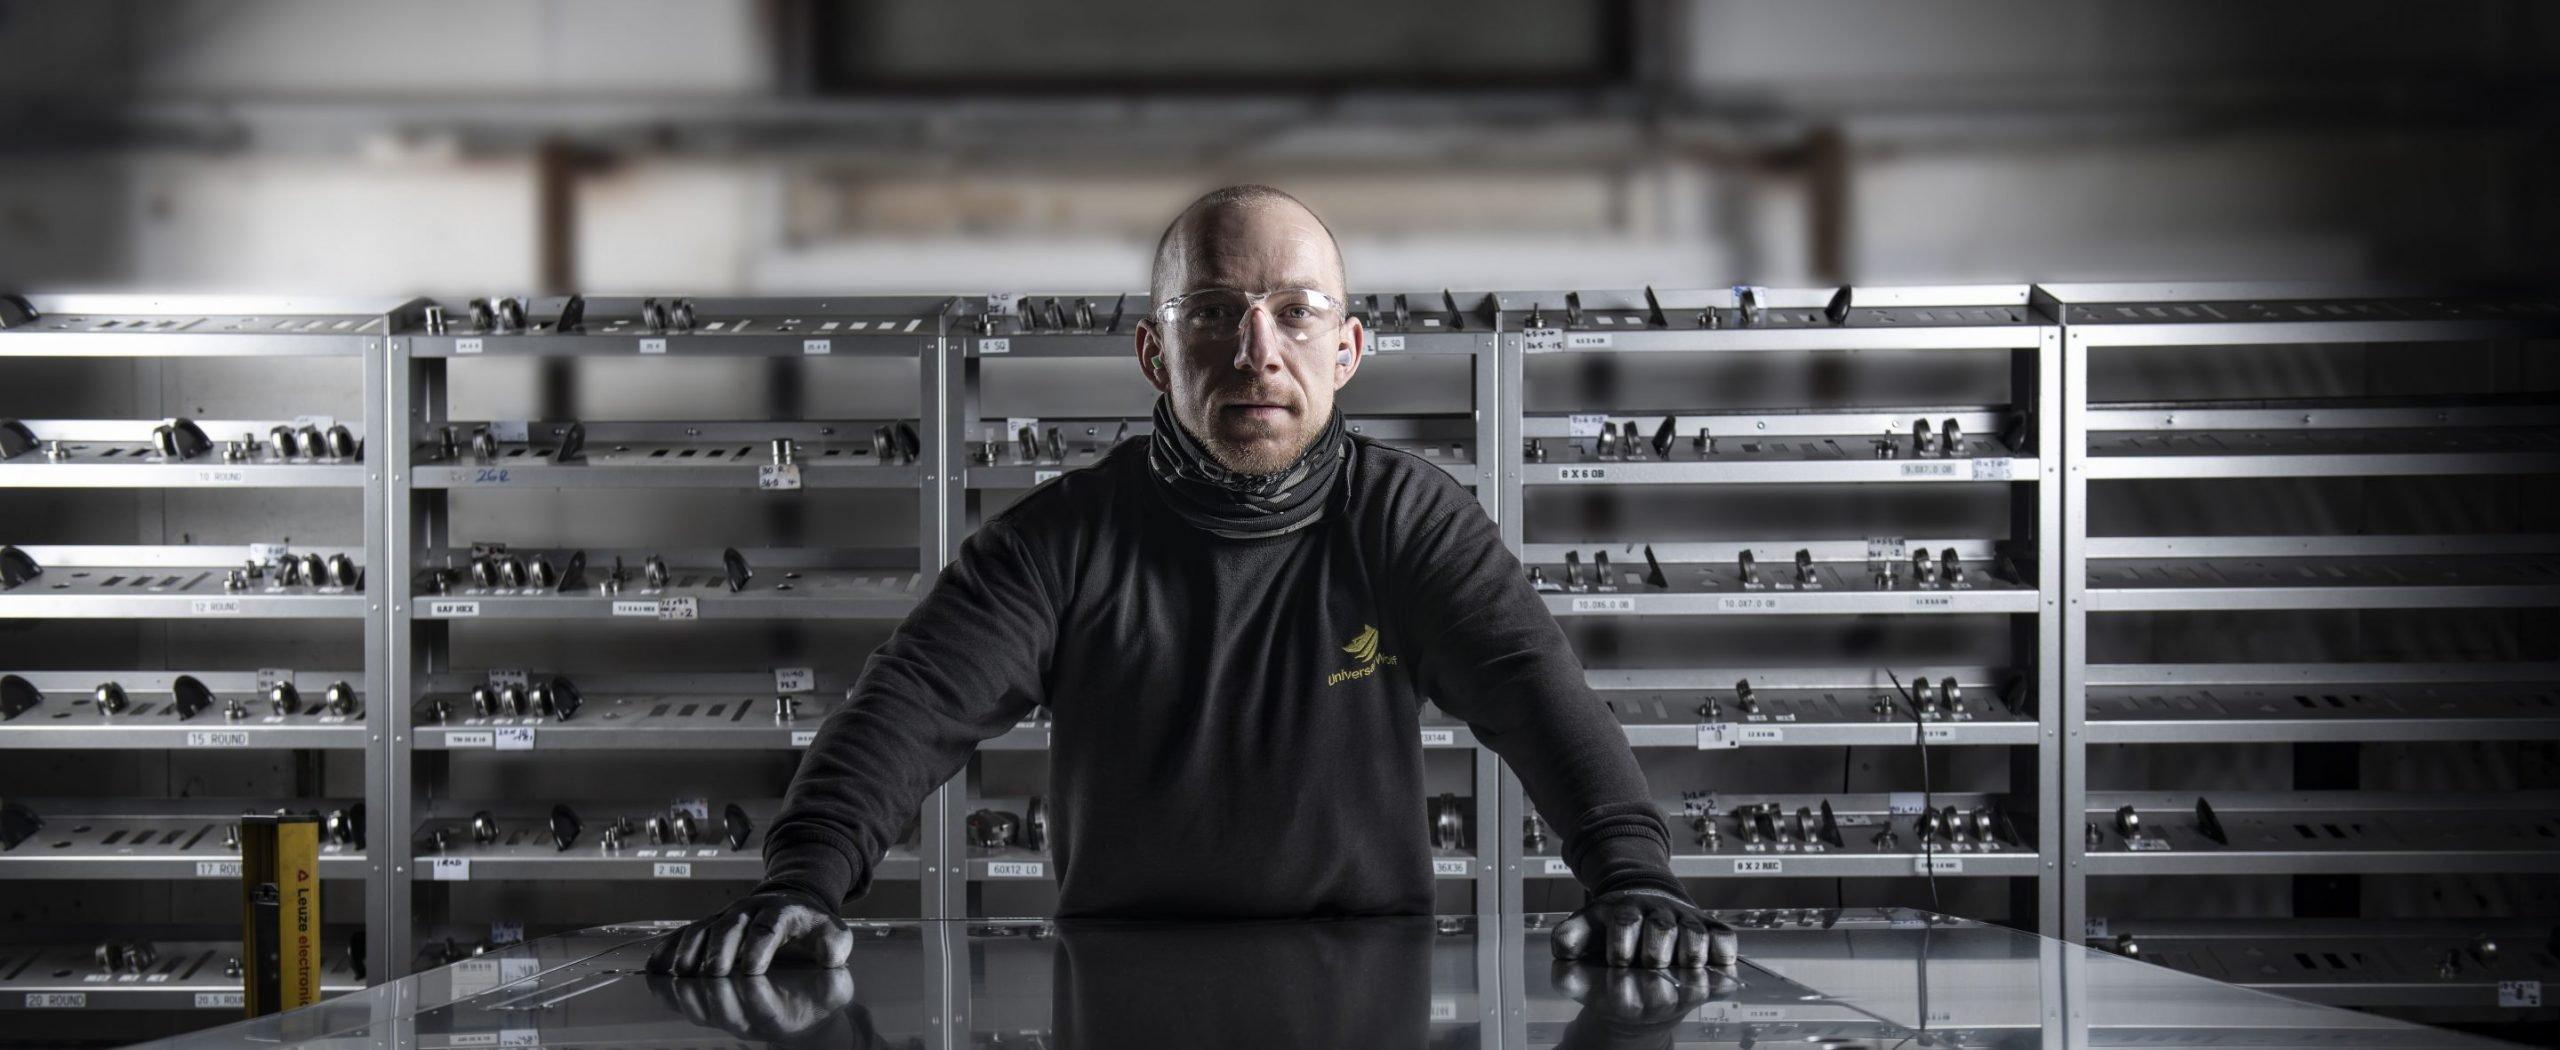 CNC punch press - metal profiling